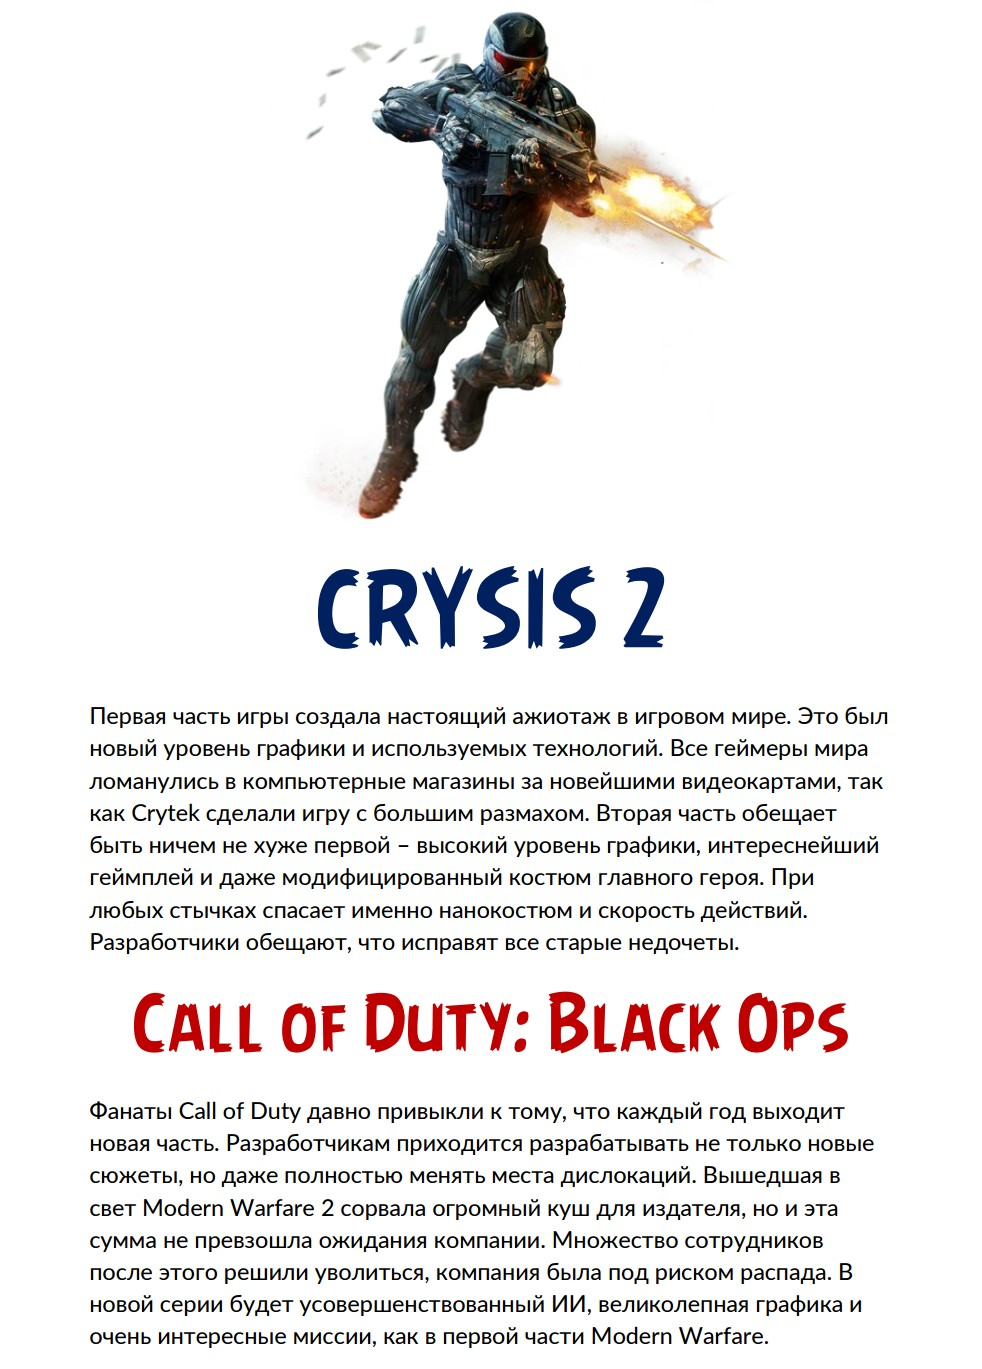 Crysis 2 и COD: Black Ops